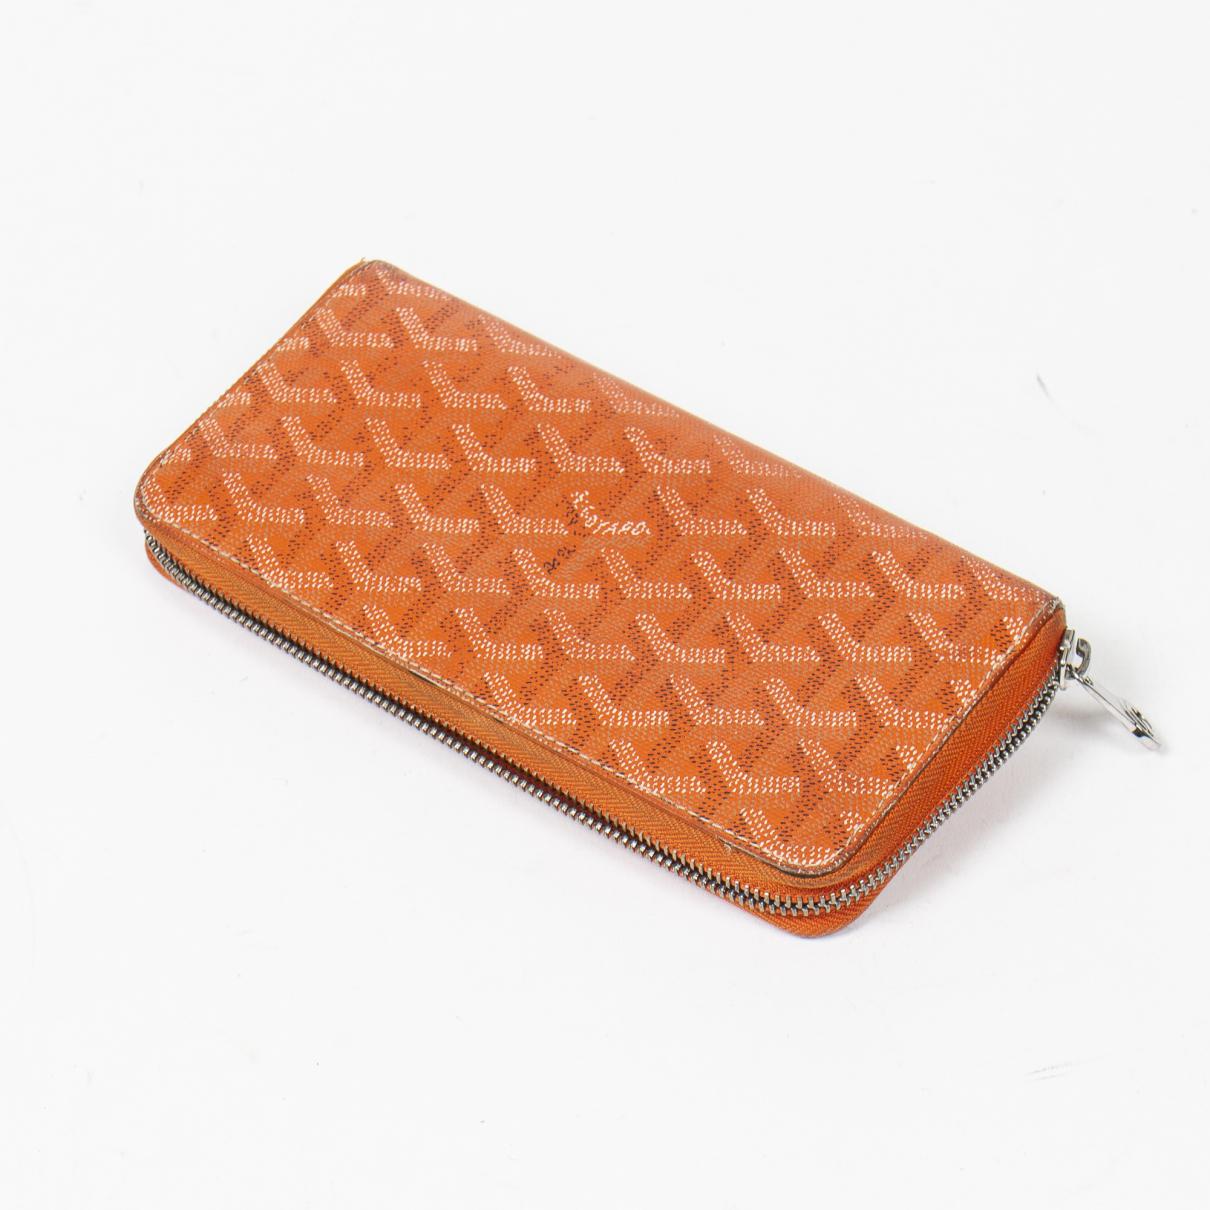 Goyard \N Orange Cotton wallet for Women \N